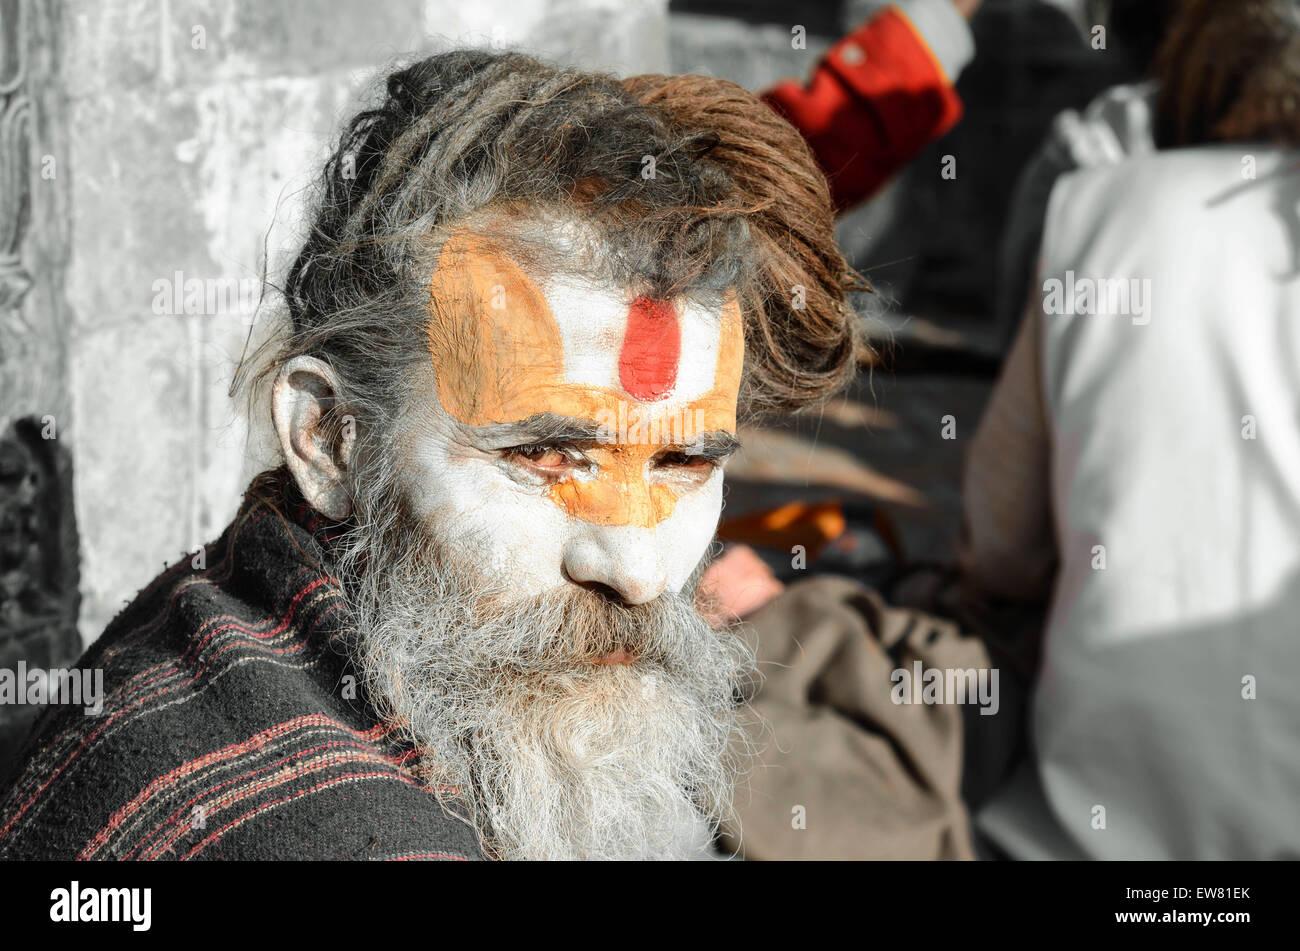 'Culturas' 'viaje' 'viaja' 'viaje' 'Asia' 'Nepal' 'man' Imagen De Stock